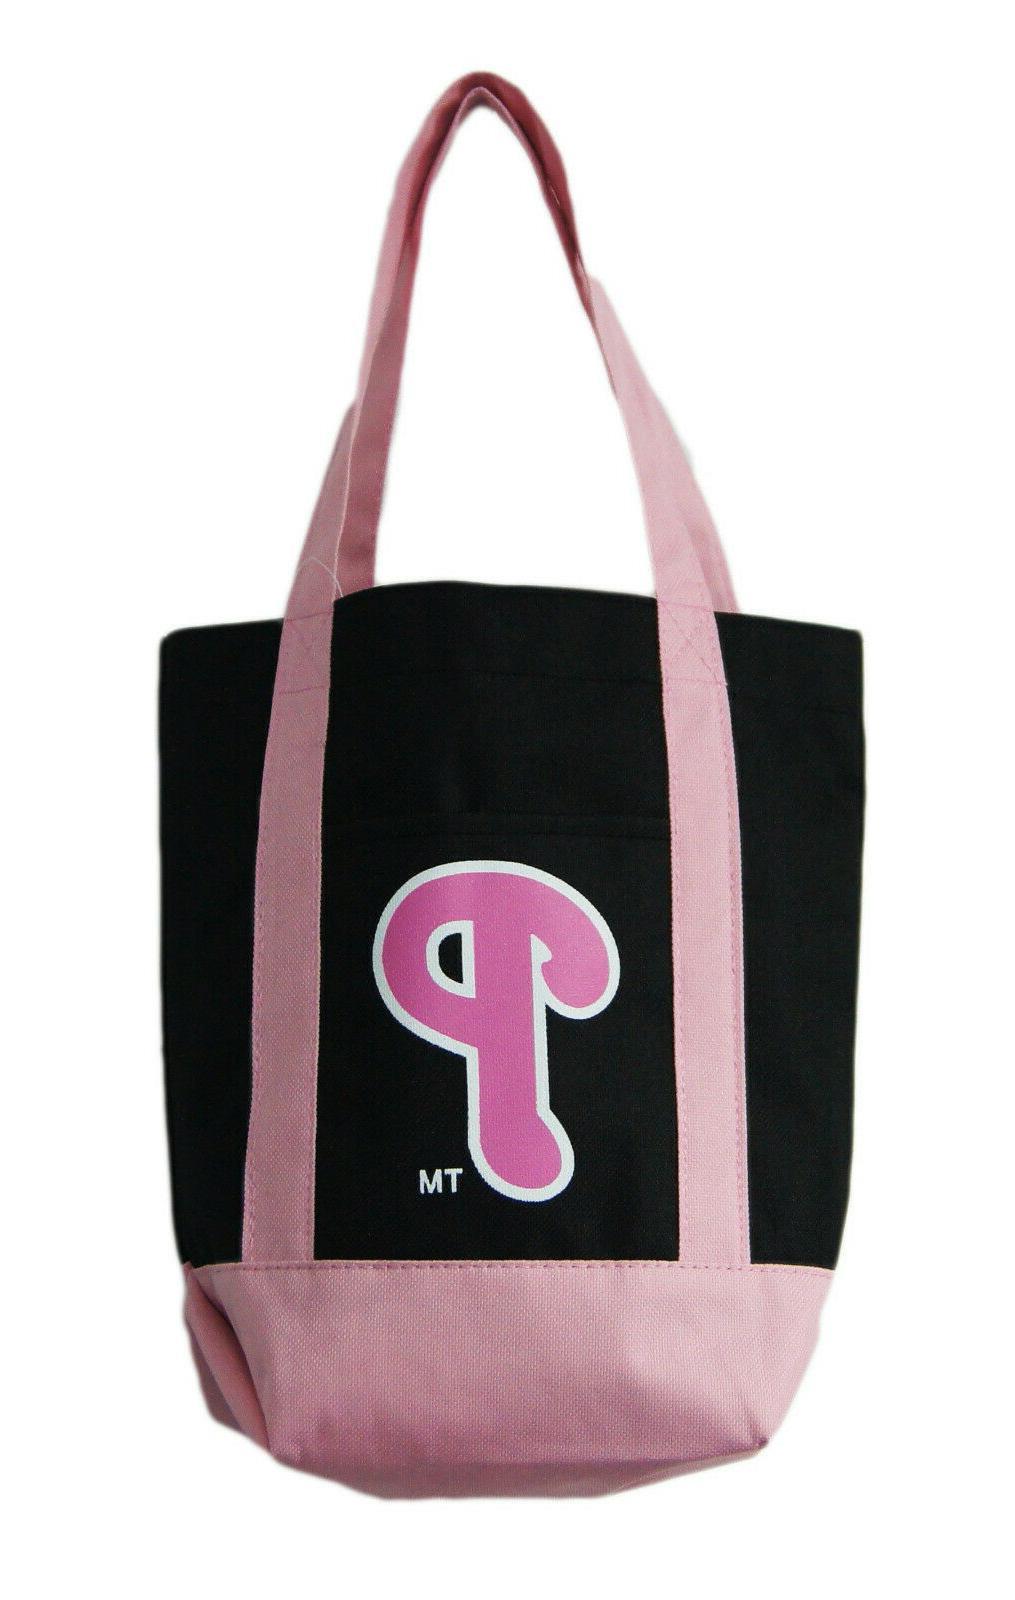 philadelphia phillies small pink black tote bag